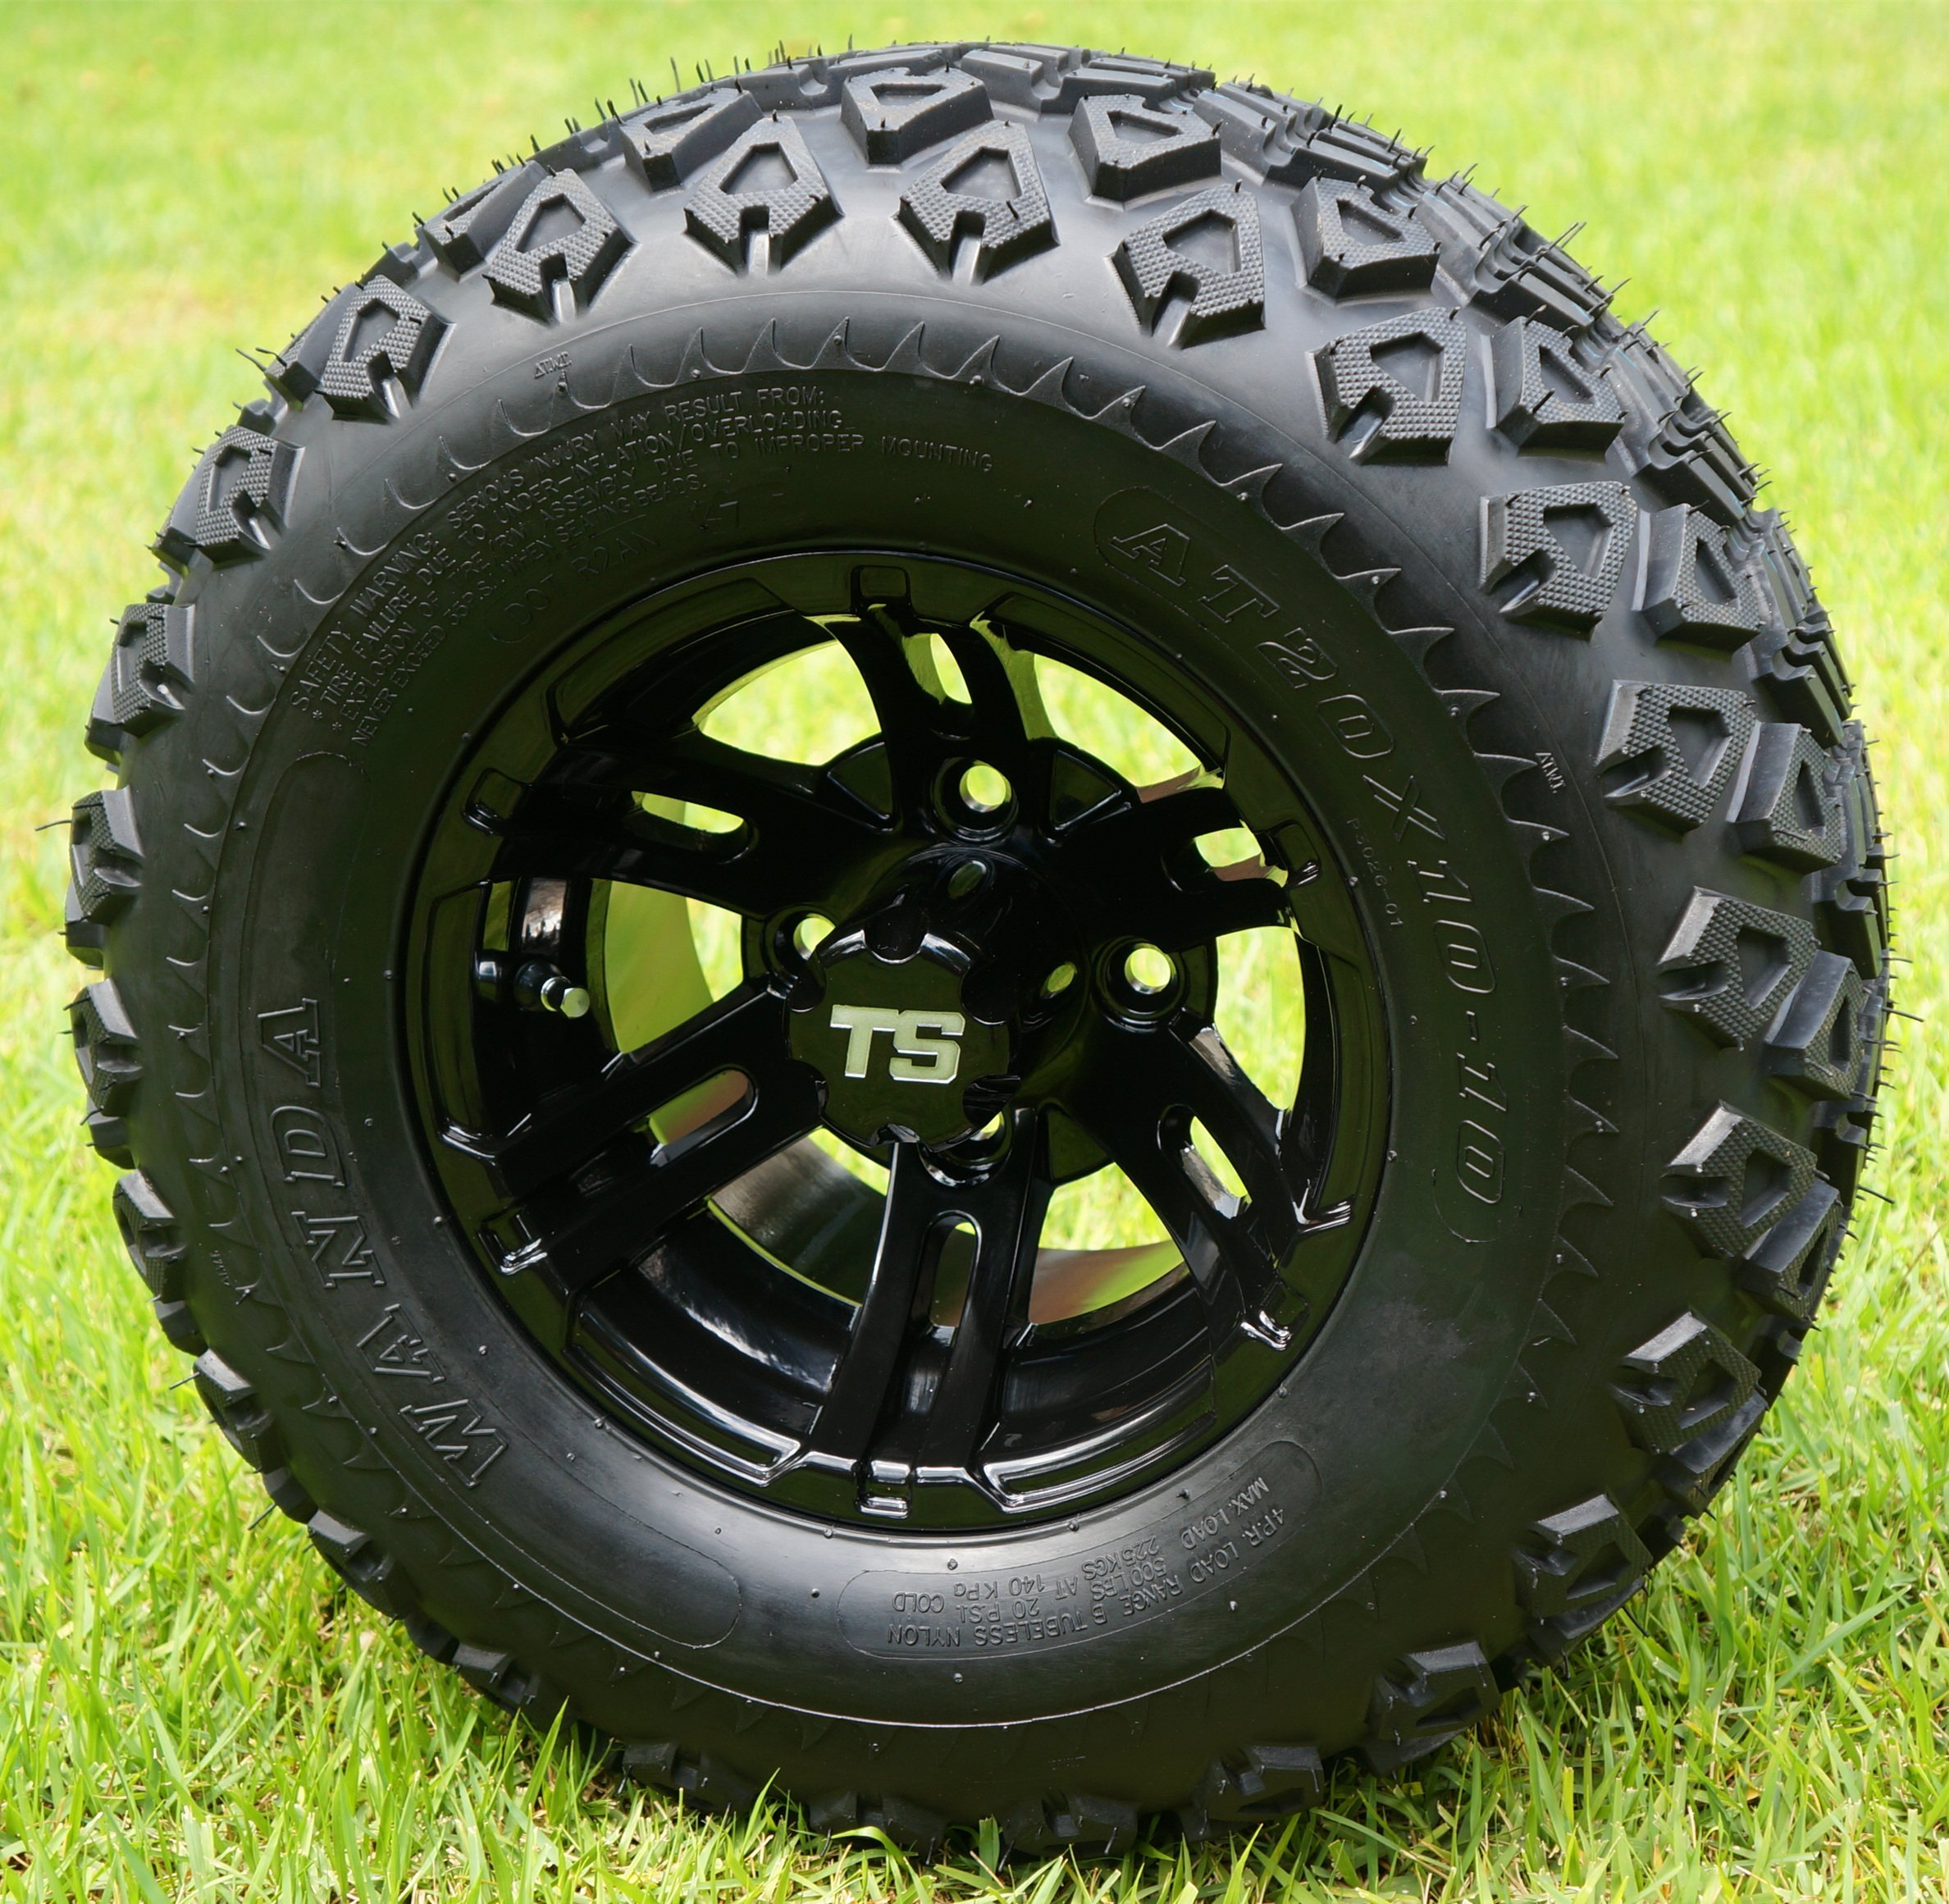 10'' BULLDOG Black Wheels and 20x10-10 DOT All Terrain Golf Cart Tires - Set of 4